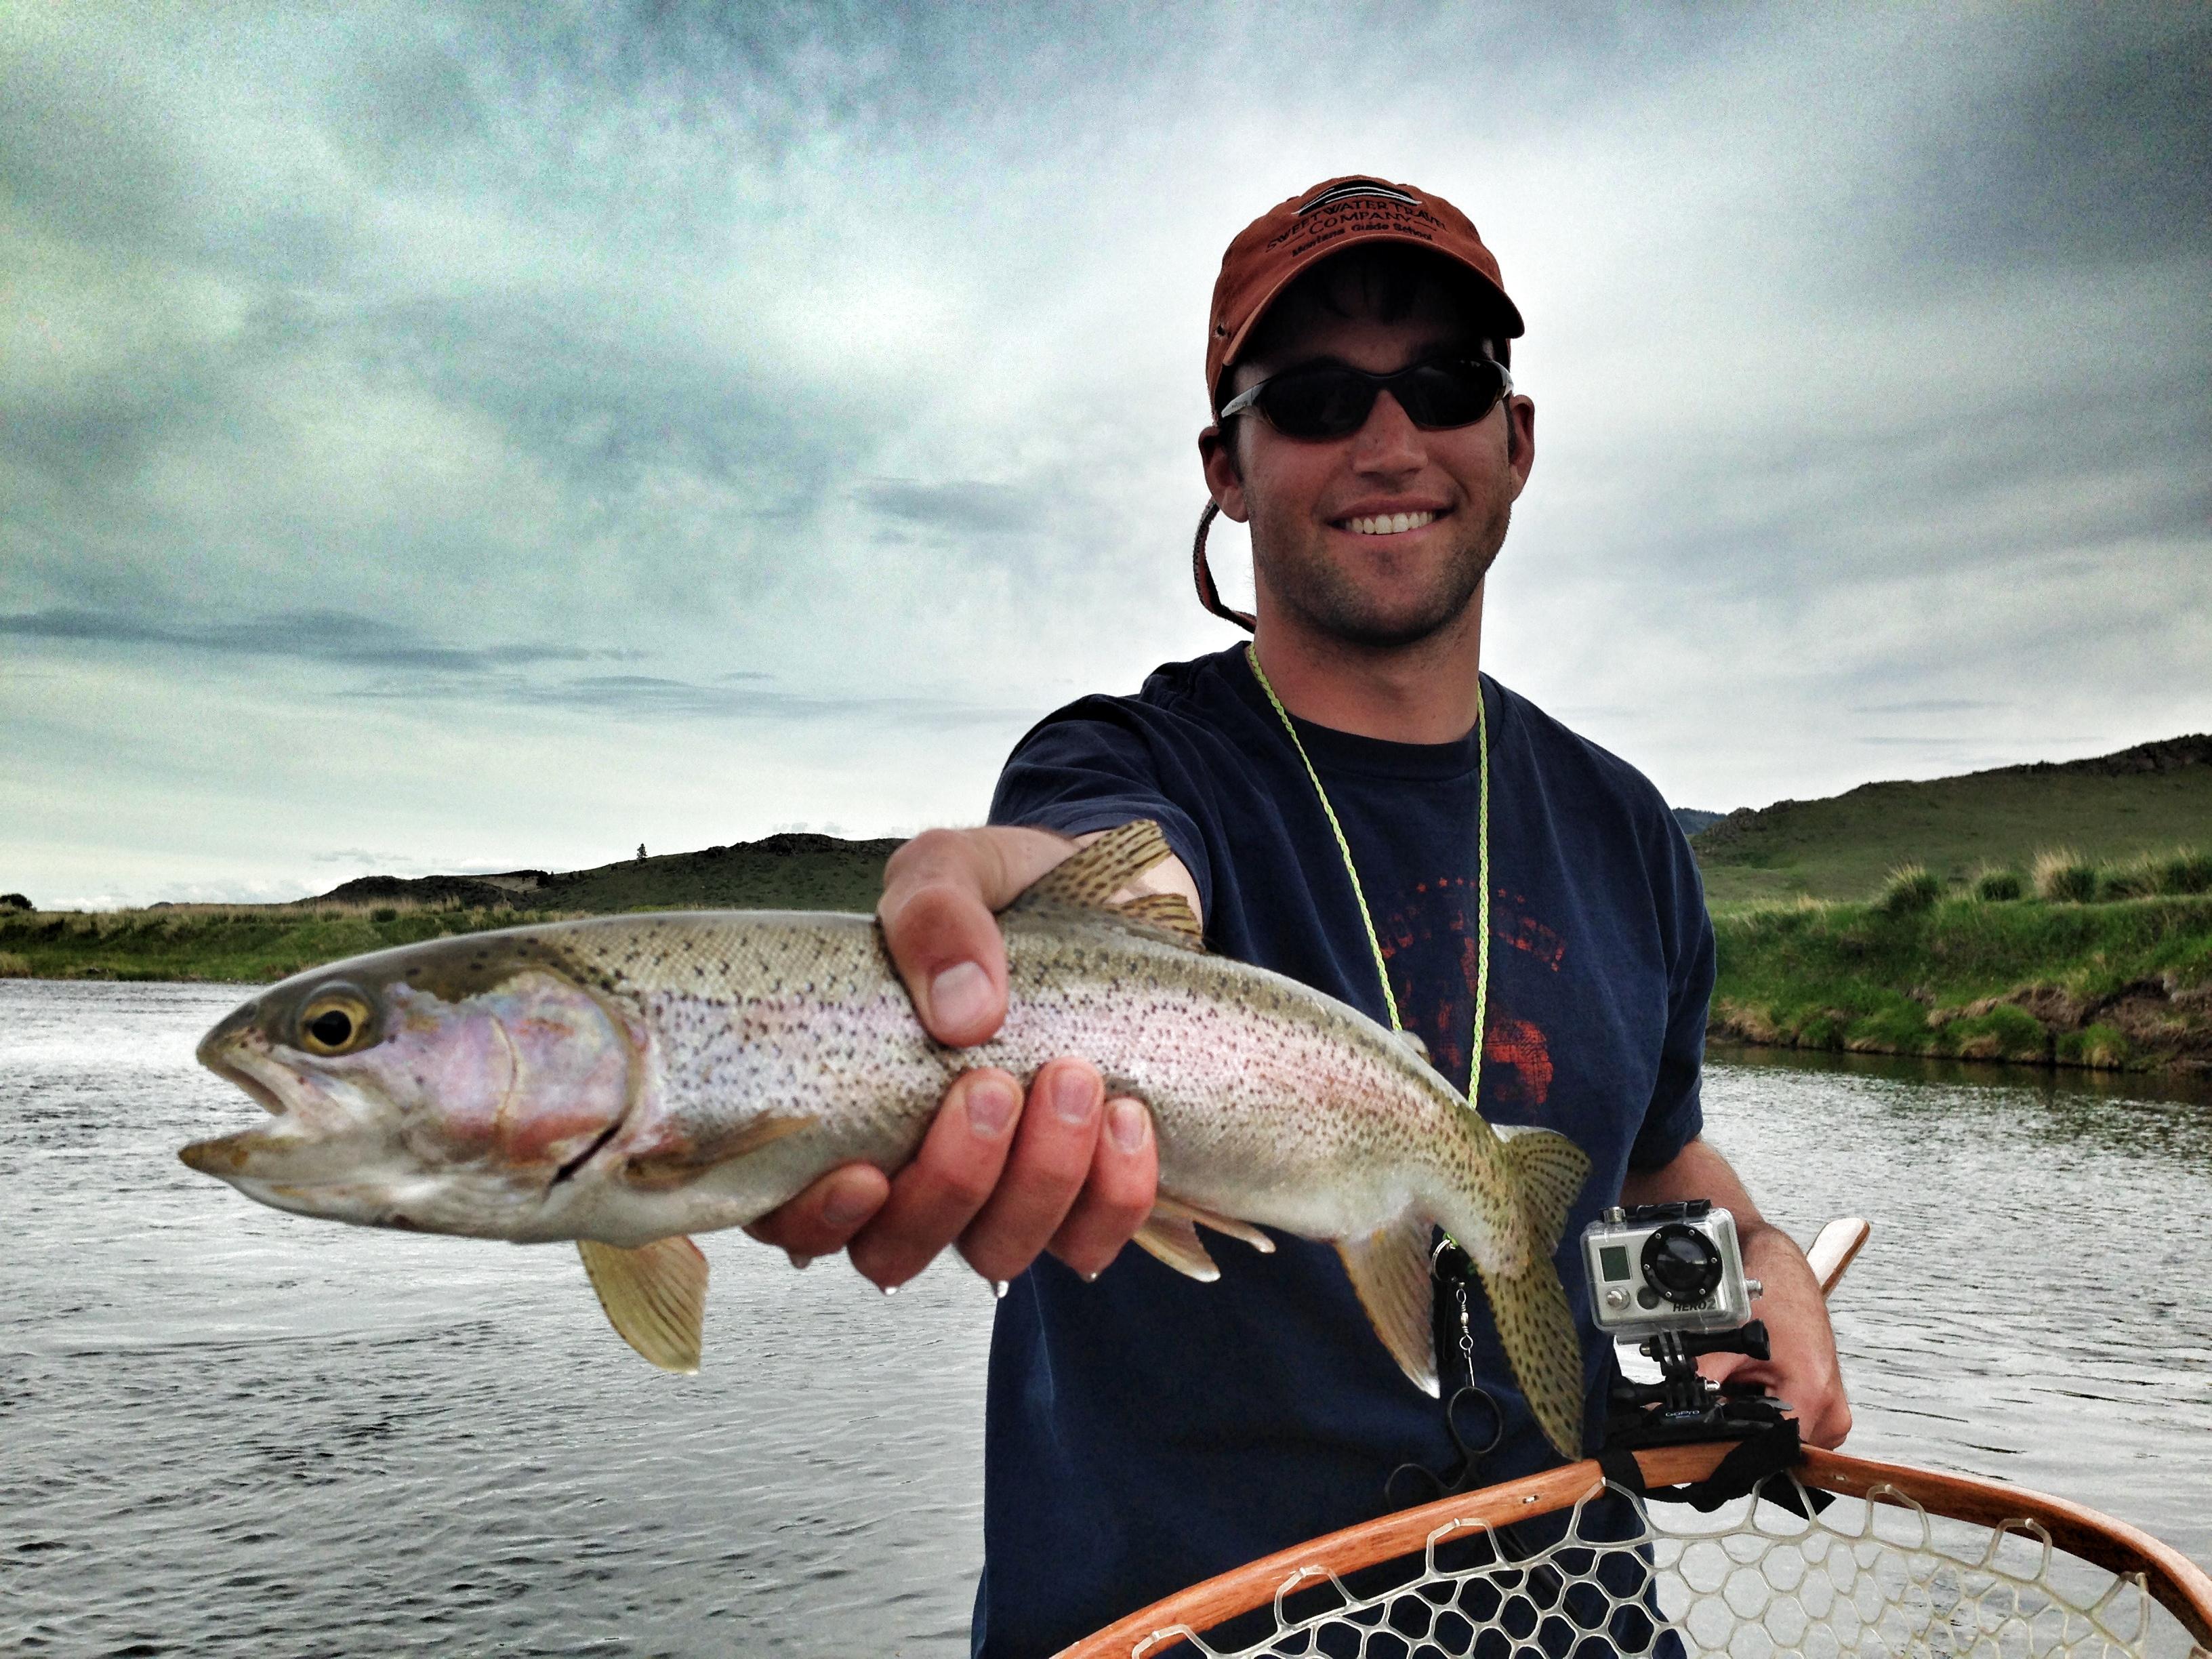 Missouri river fishing report 6 2 13 crosscurrents fly for Missouri fishing report